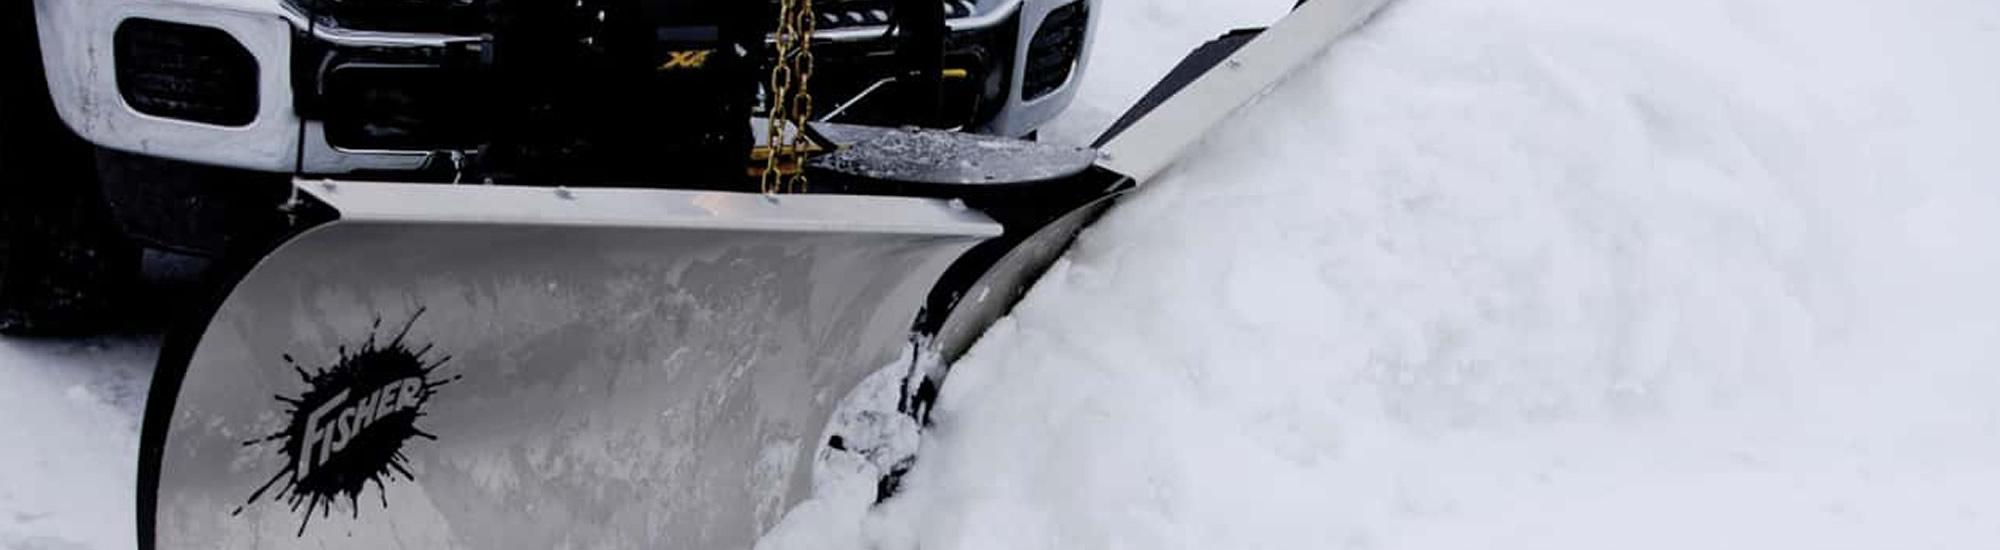 Header Image - castlefordexcavating-snow-removal-banner-1-1531165092.jpg